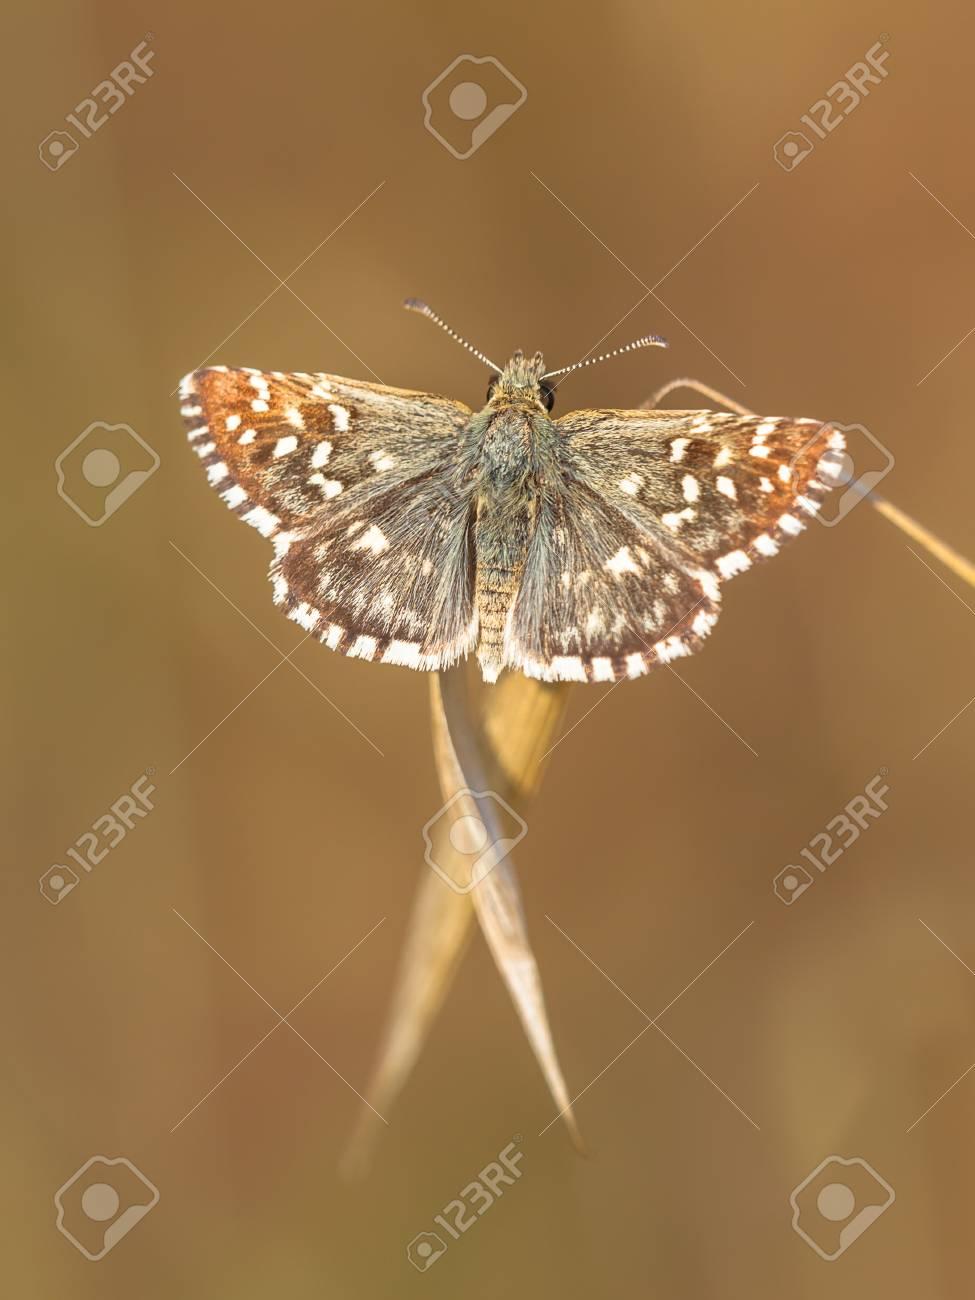 https fr 123rf com photo 26229059 brown papillon c3 a0 pois blanc sur brown grass with fond marron html